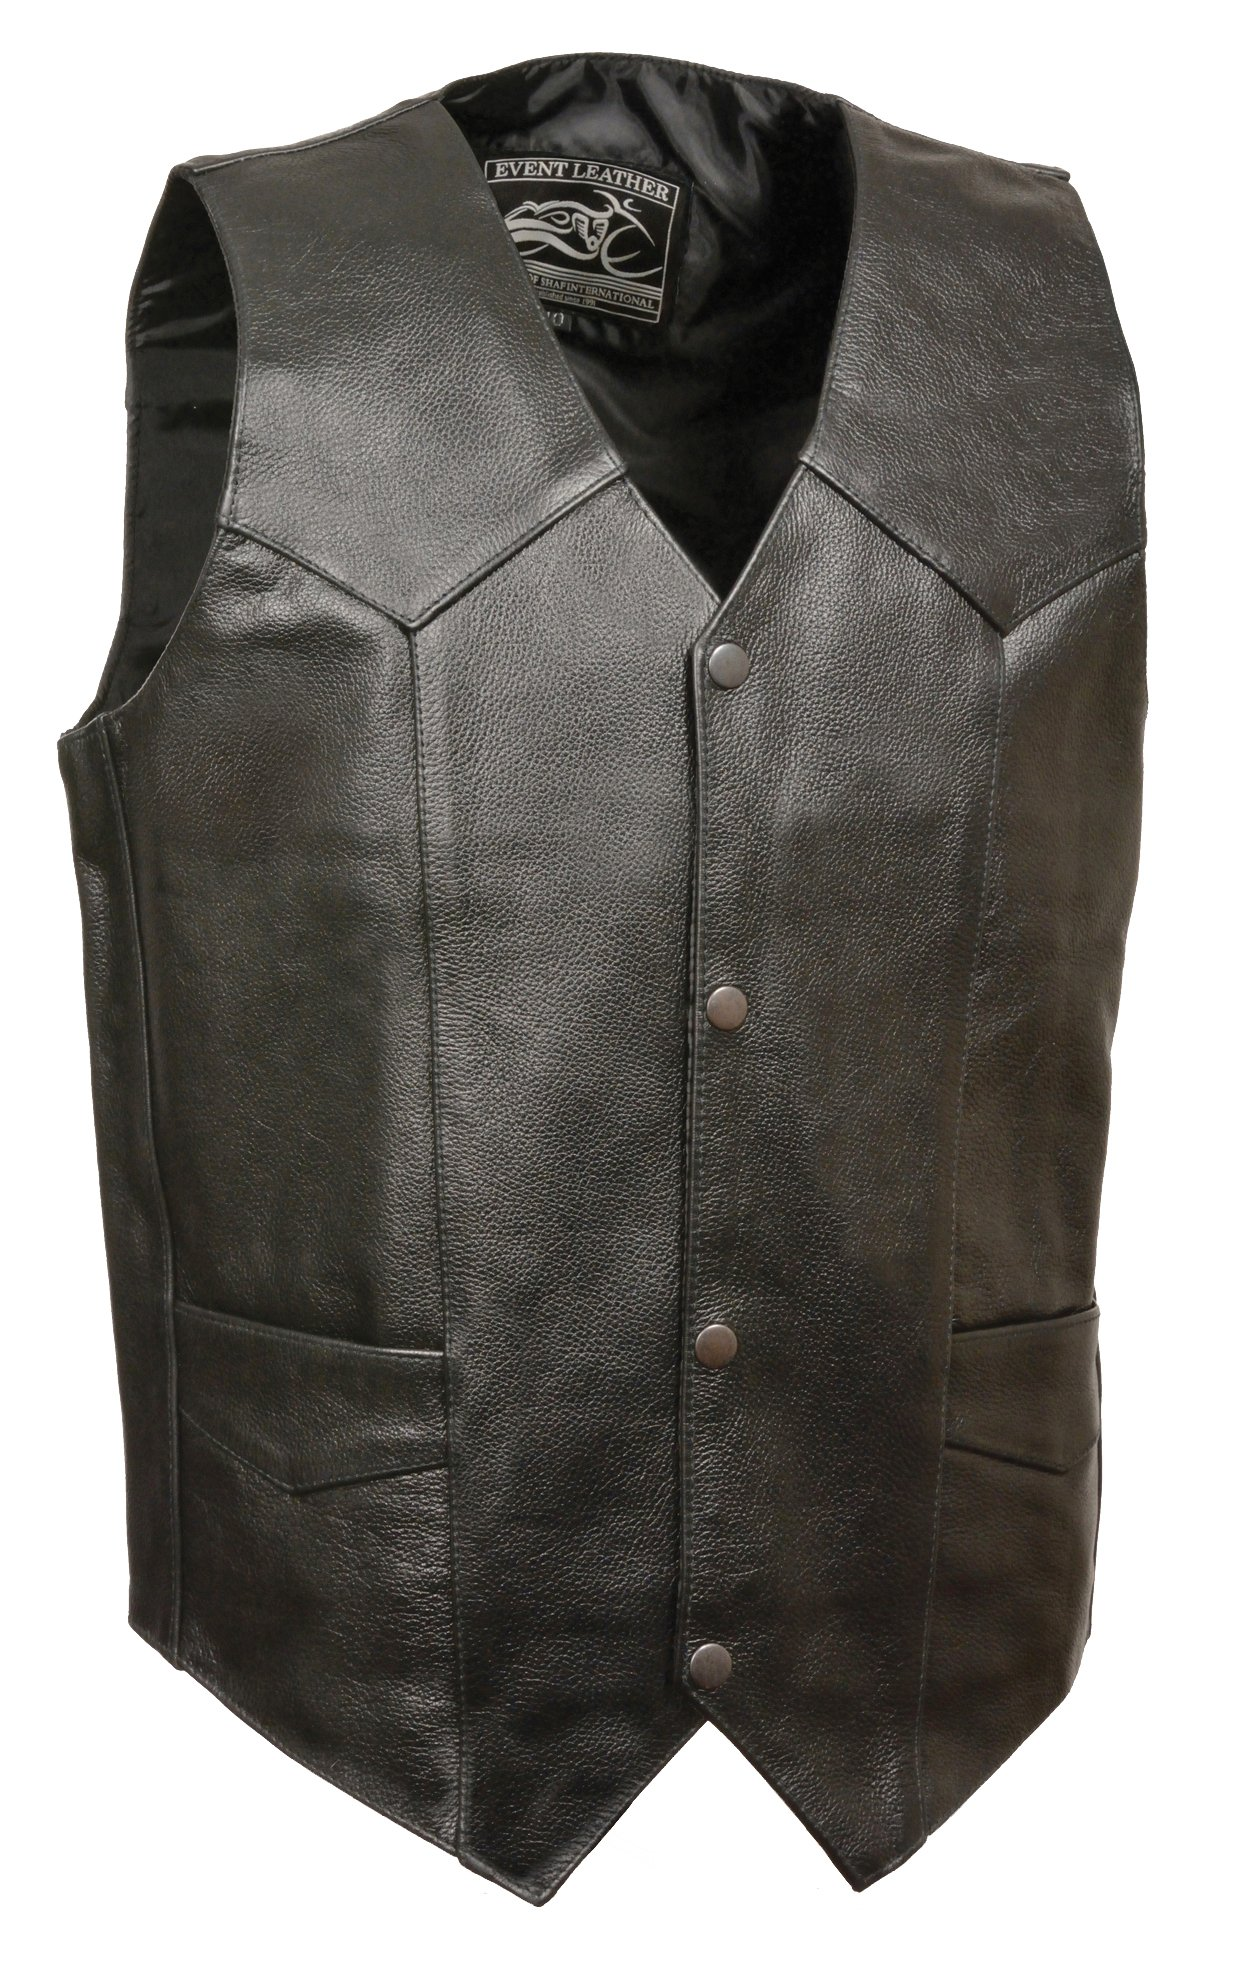 Event Biker Leather Men's Promo Basic Leather Vest (Black, X-Large) by Event Biker Leather